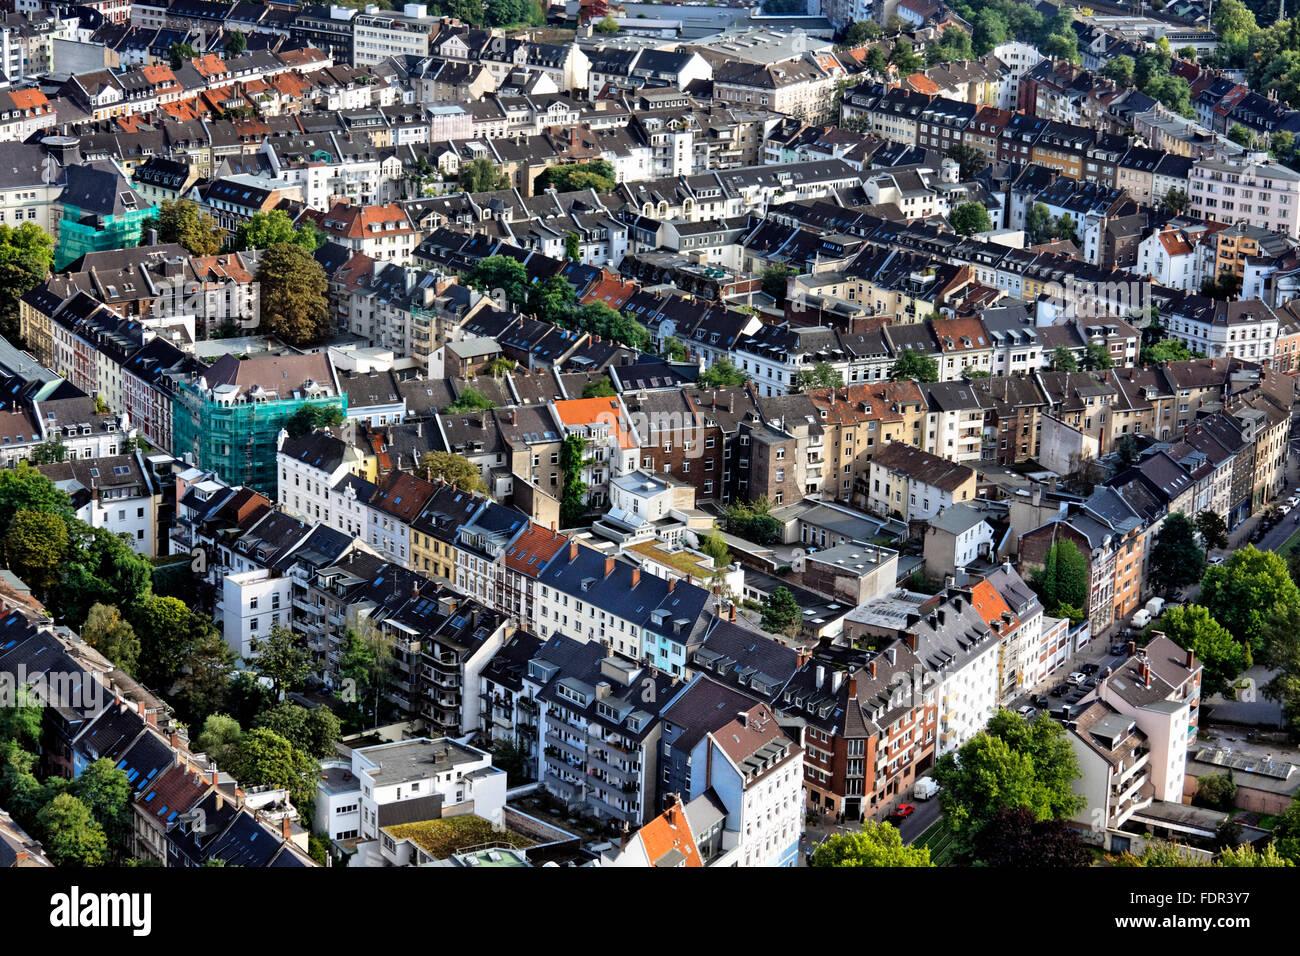 düsseldorf,residential area - Stock Image